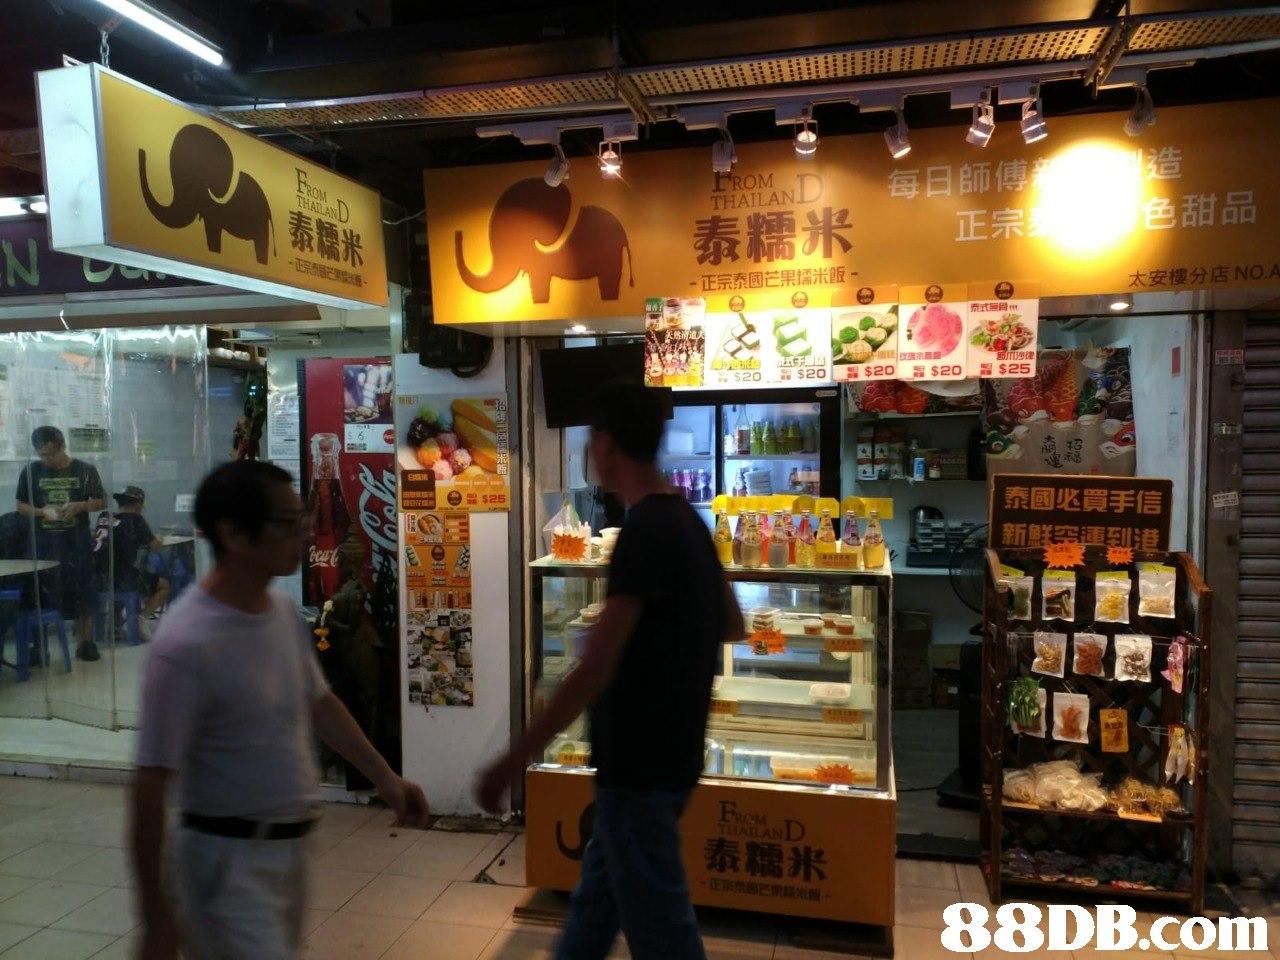 THAILAN 正宗 正宗泰國芒果糯米 太安樓分店No.A $25 泰國必買手 泰糯米   retail,fast food,